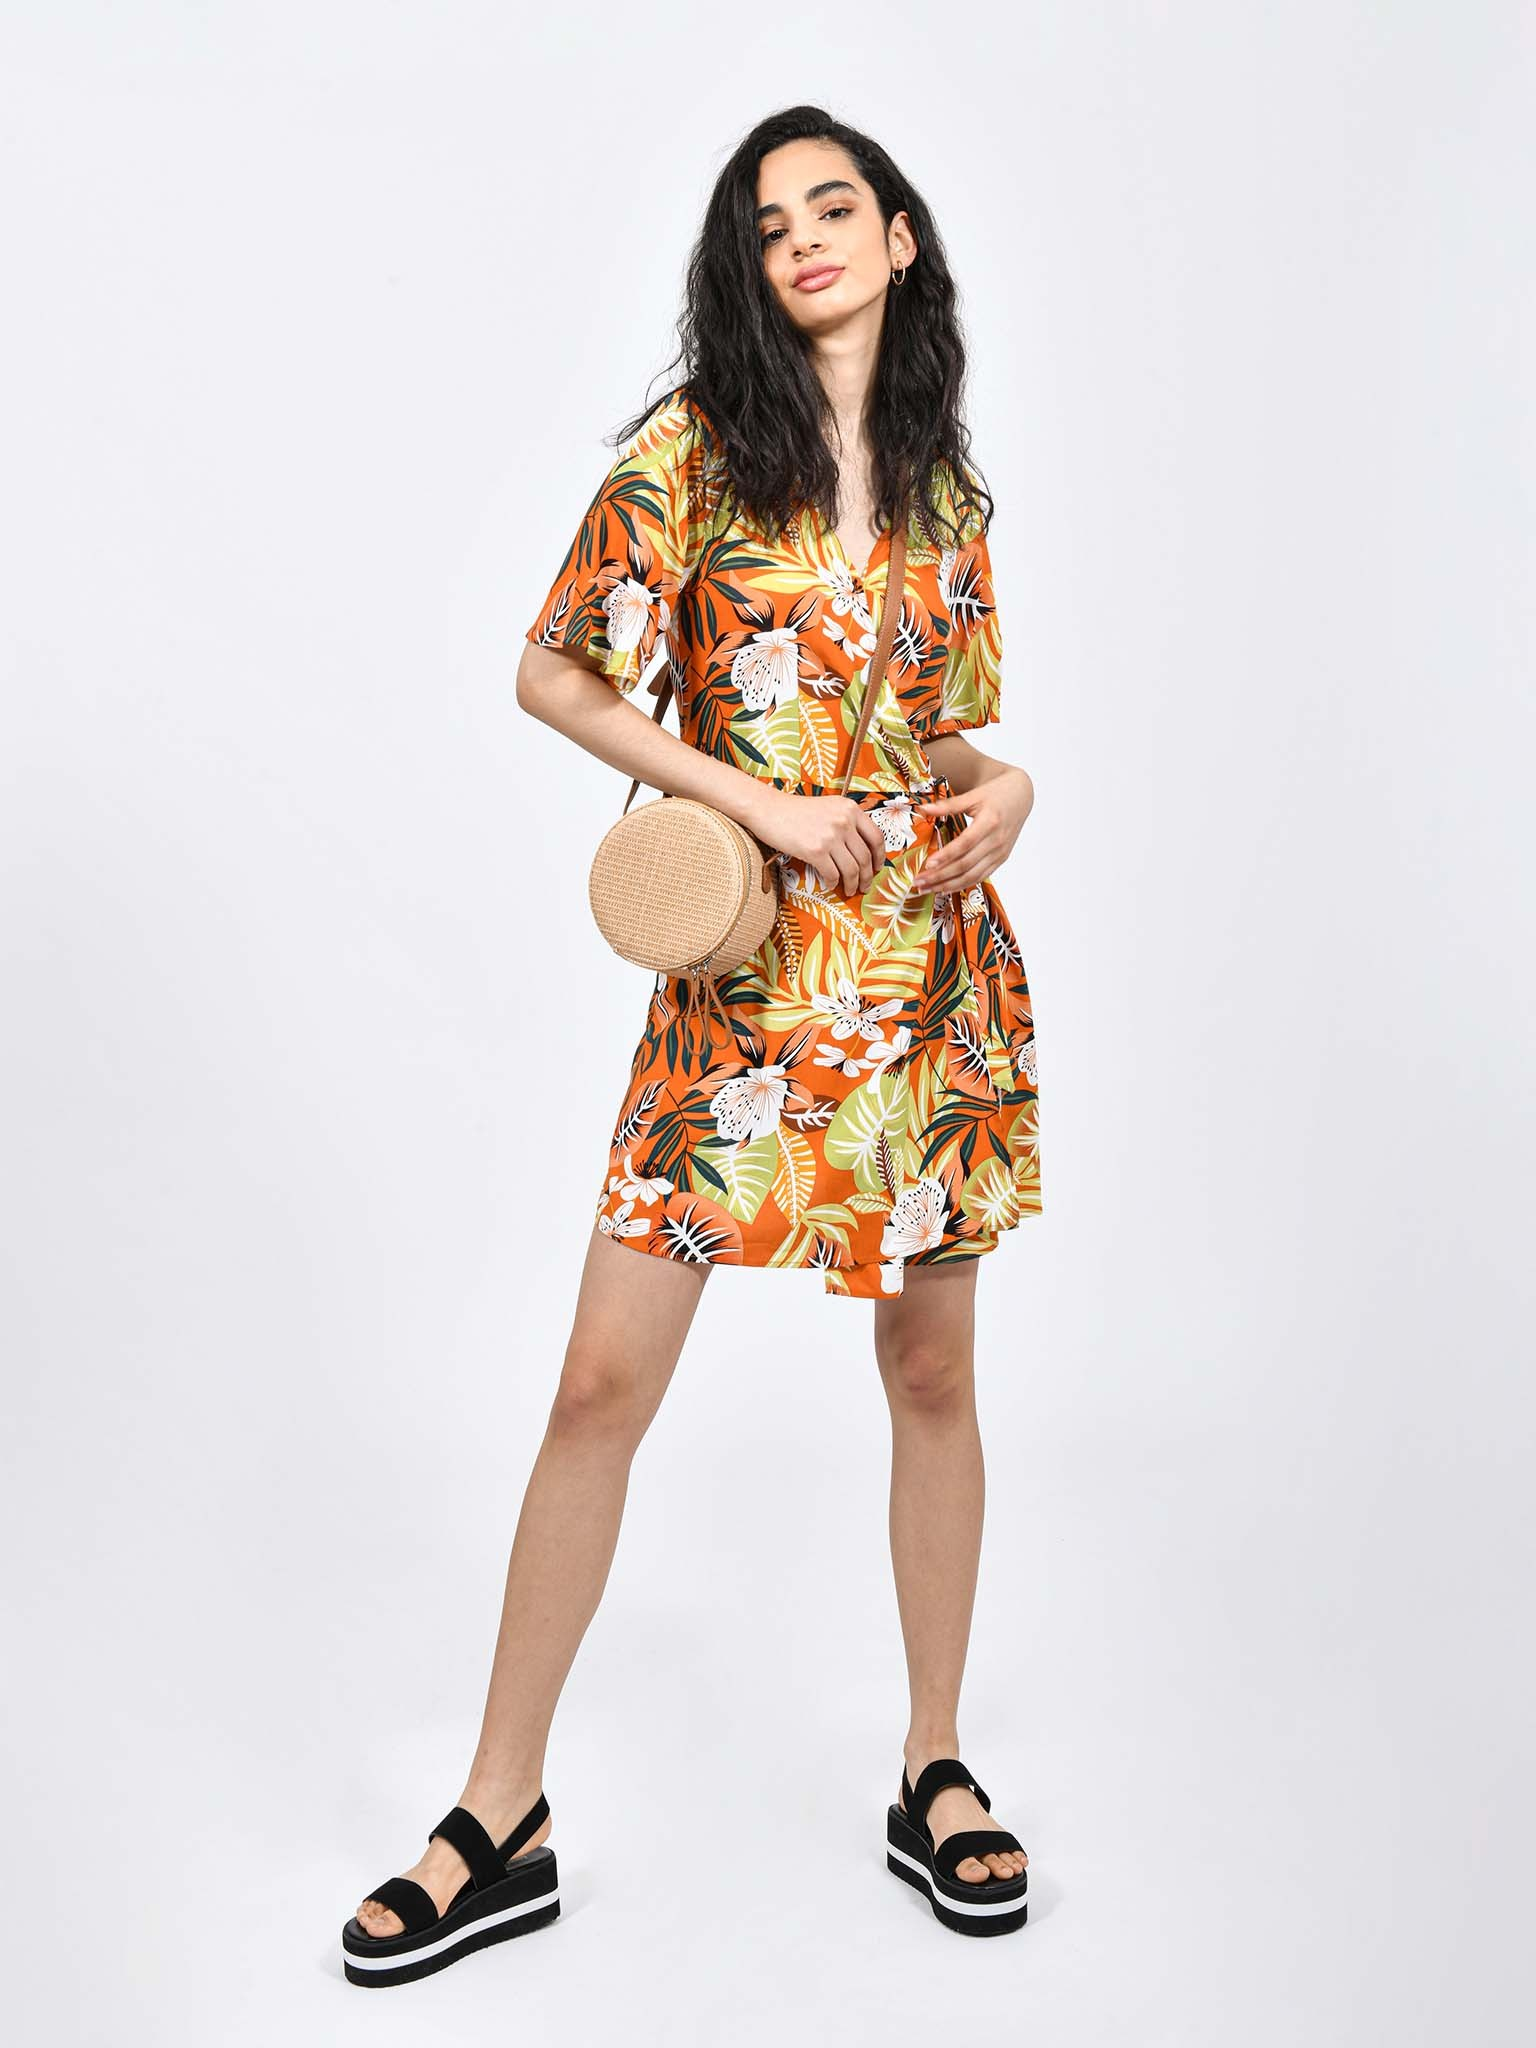 Oferta de Vestido Casual Print Tropical por $242.1